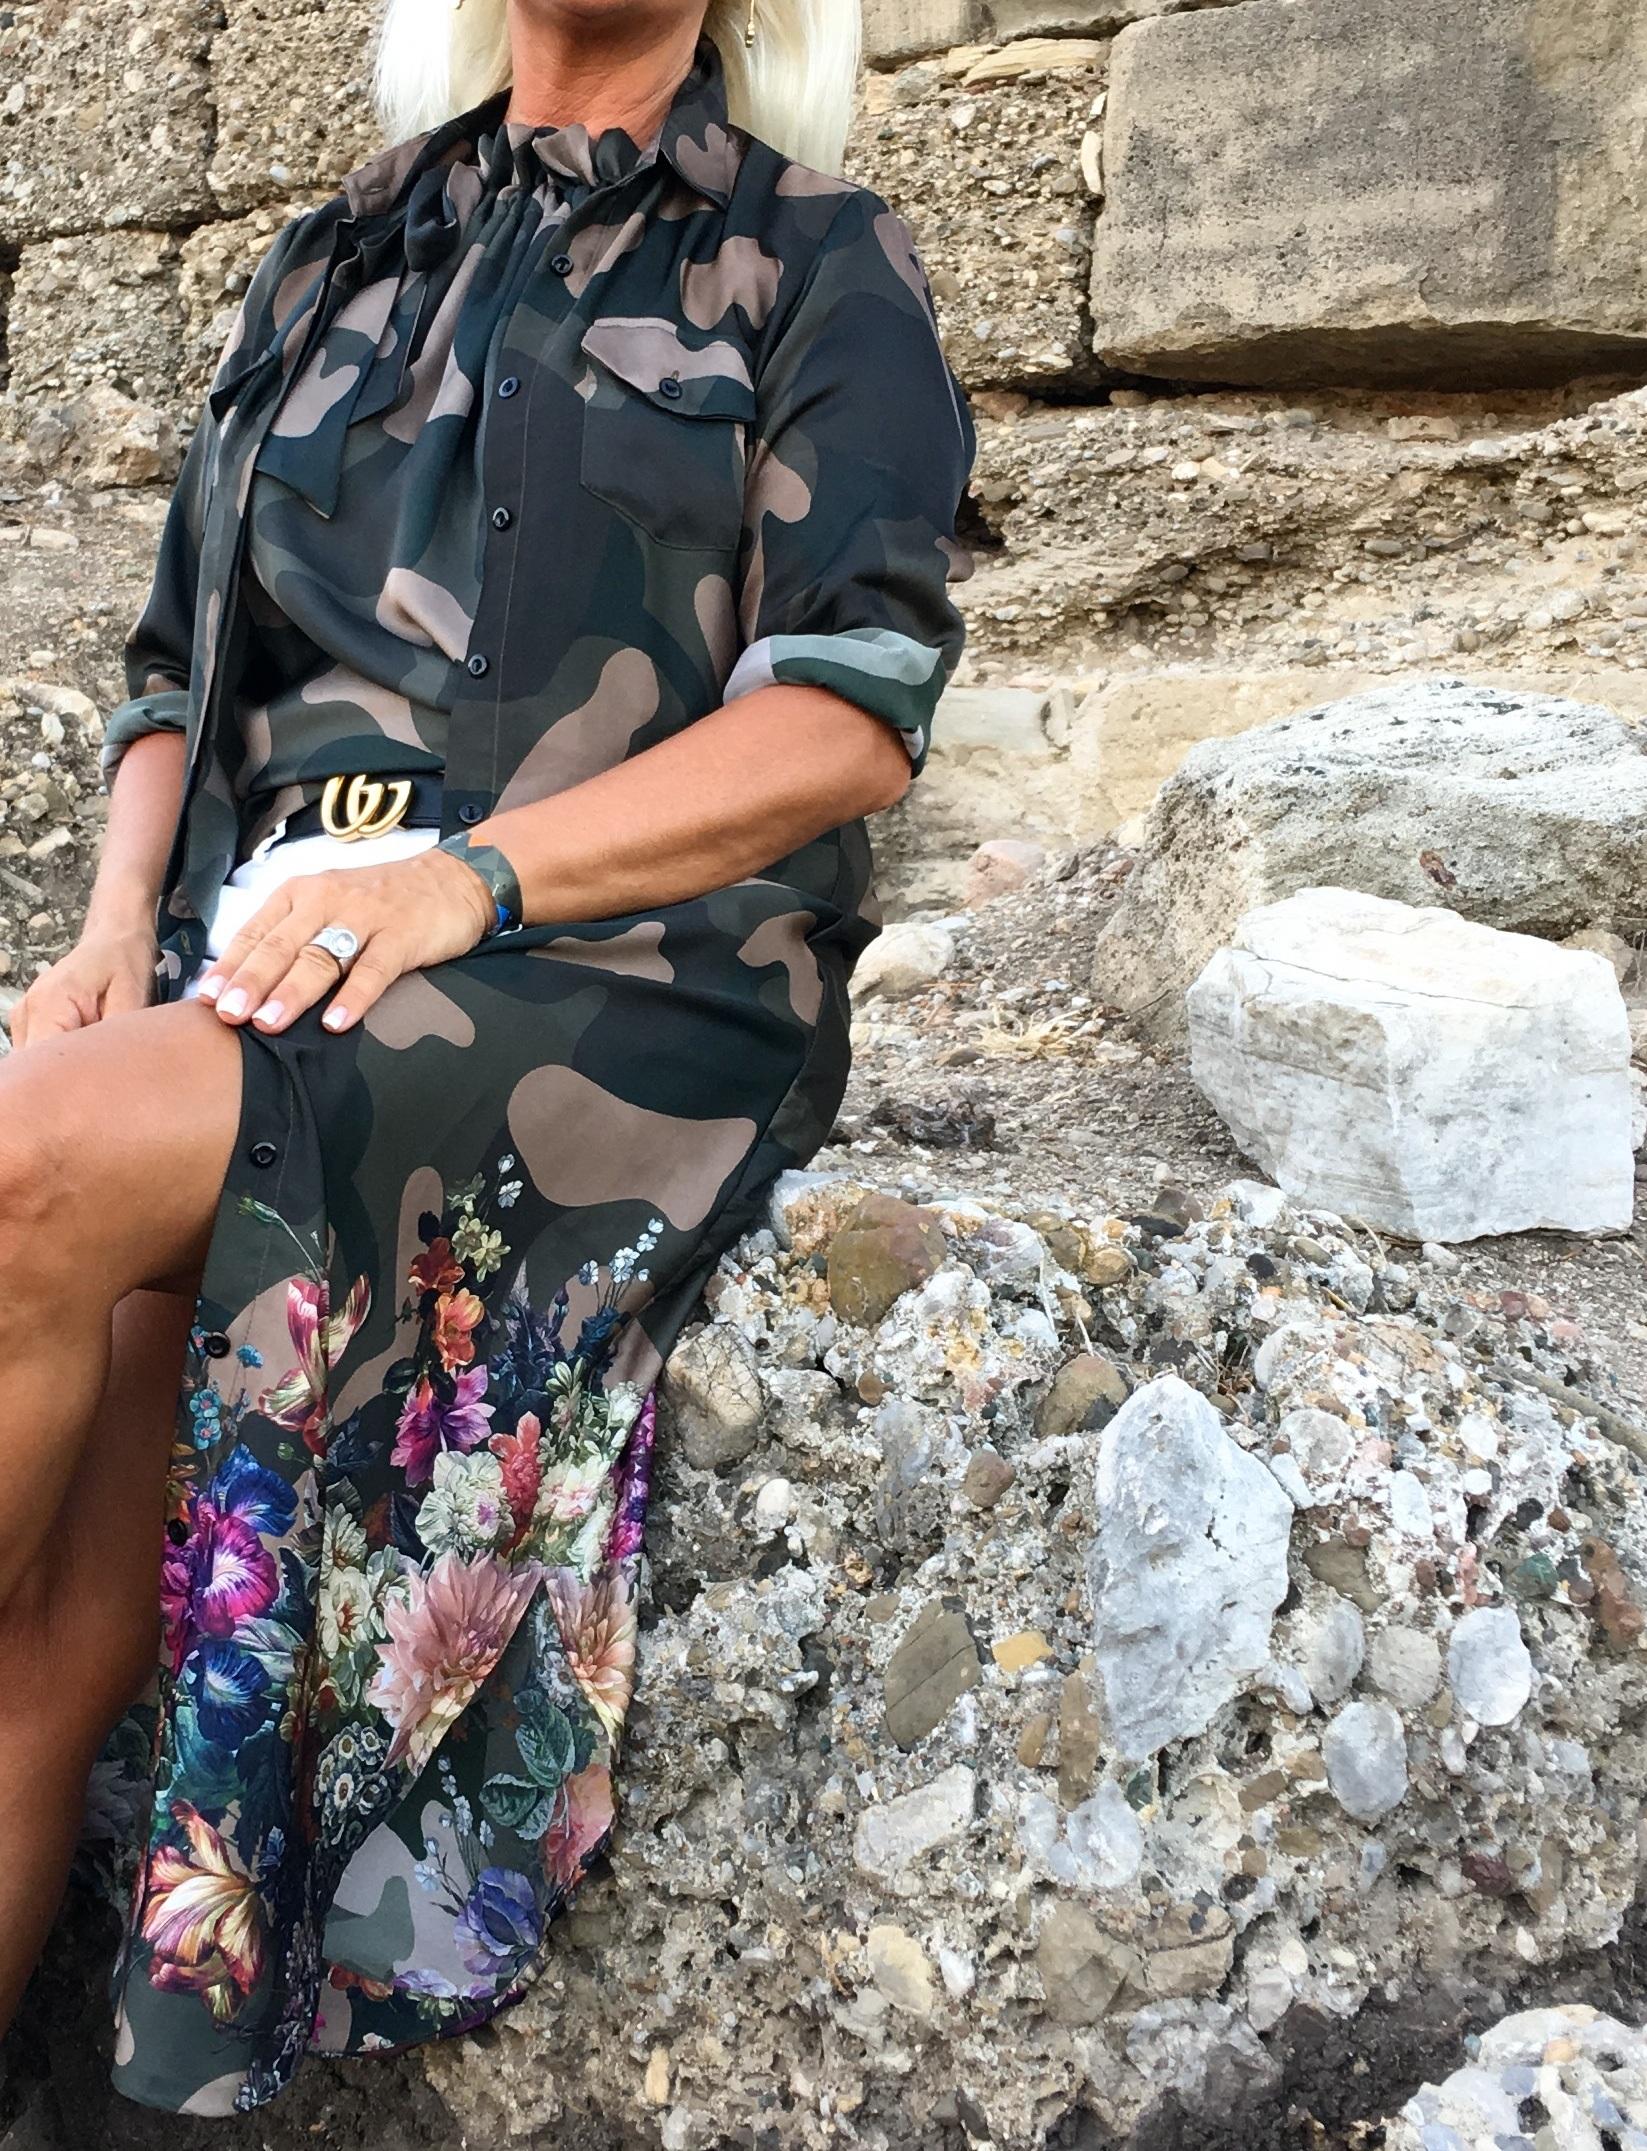 Karmamia camo image by me